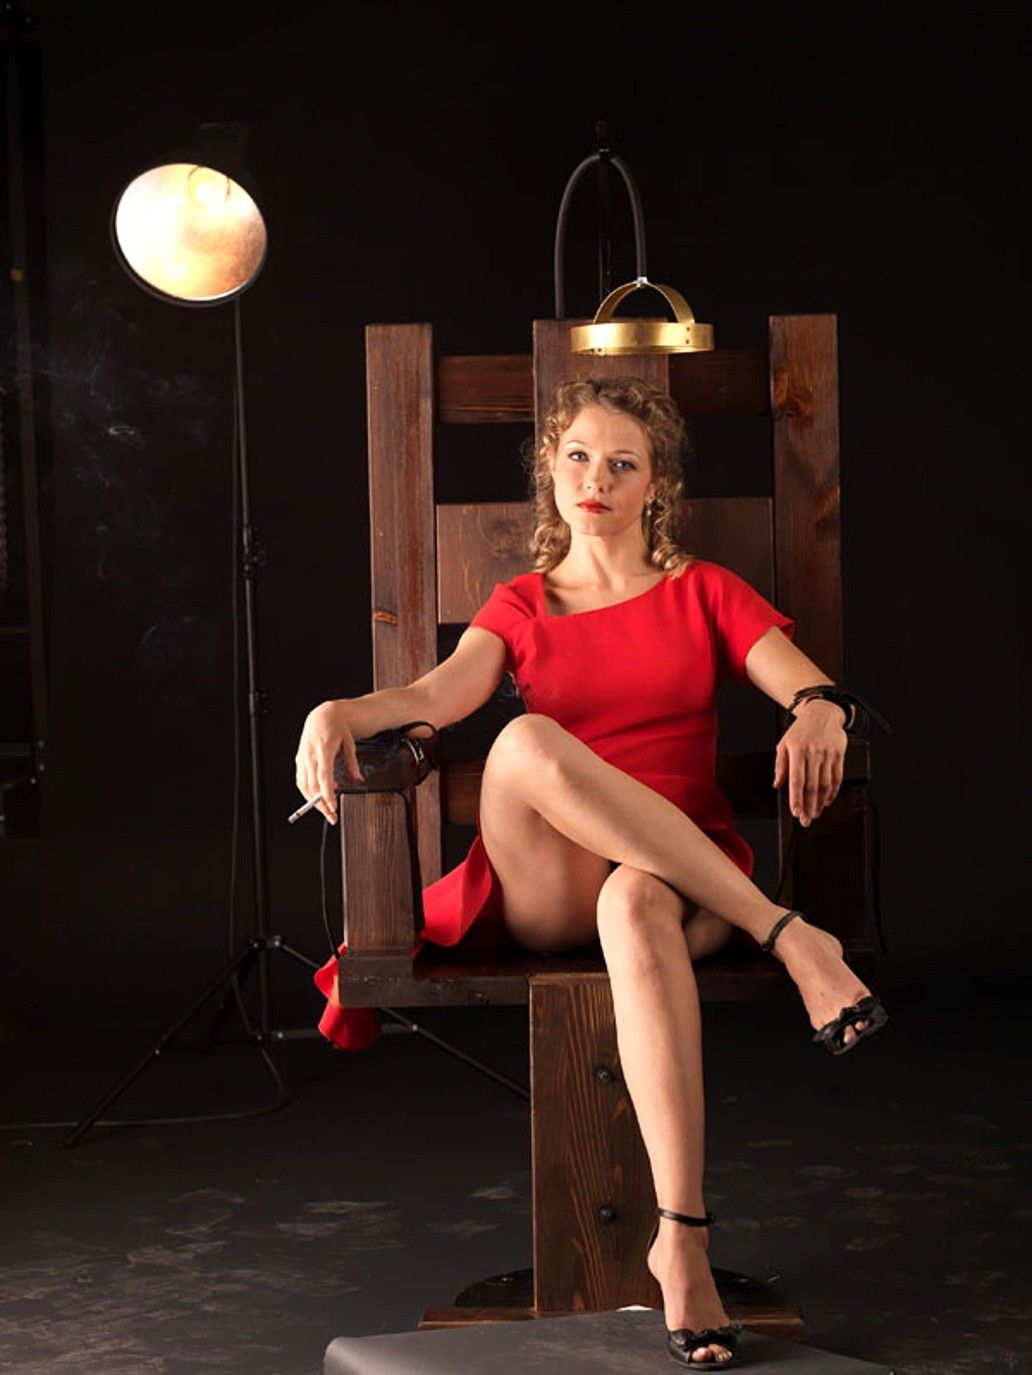 golaya-aktrisa-bolgova